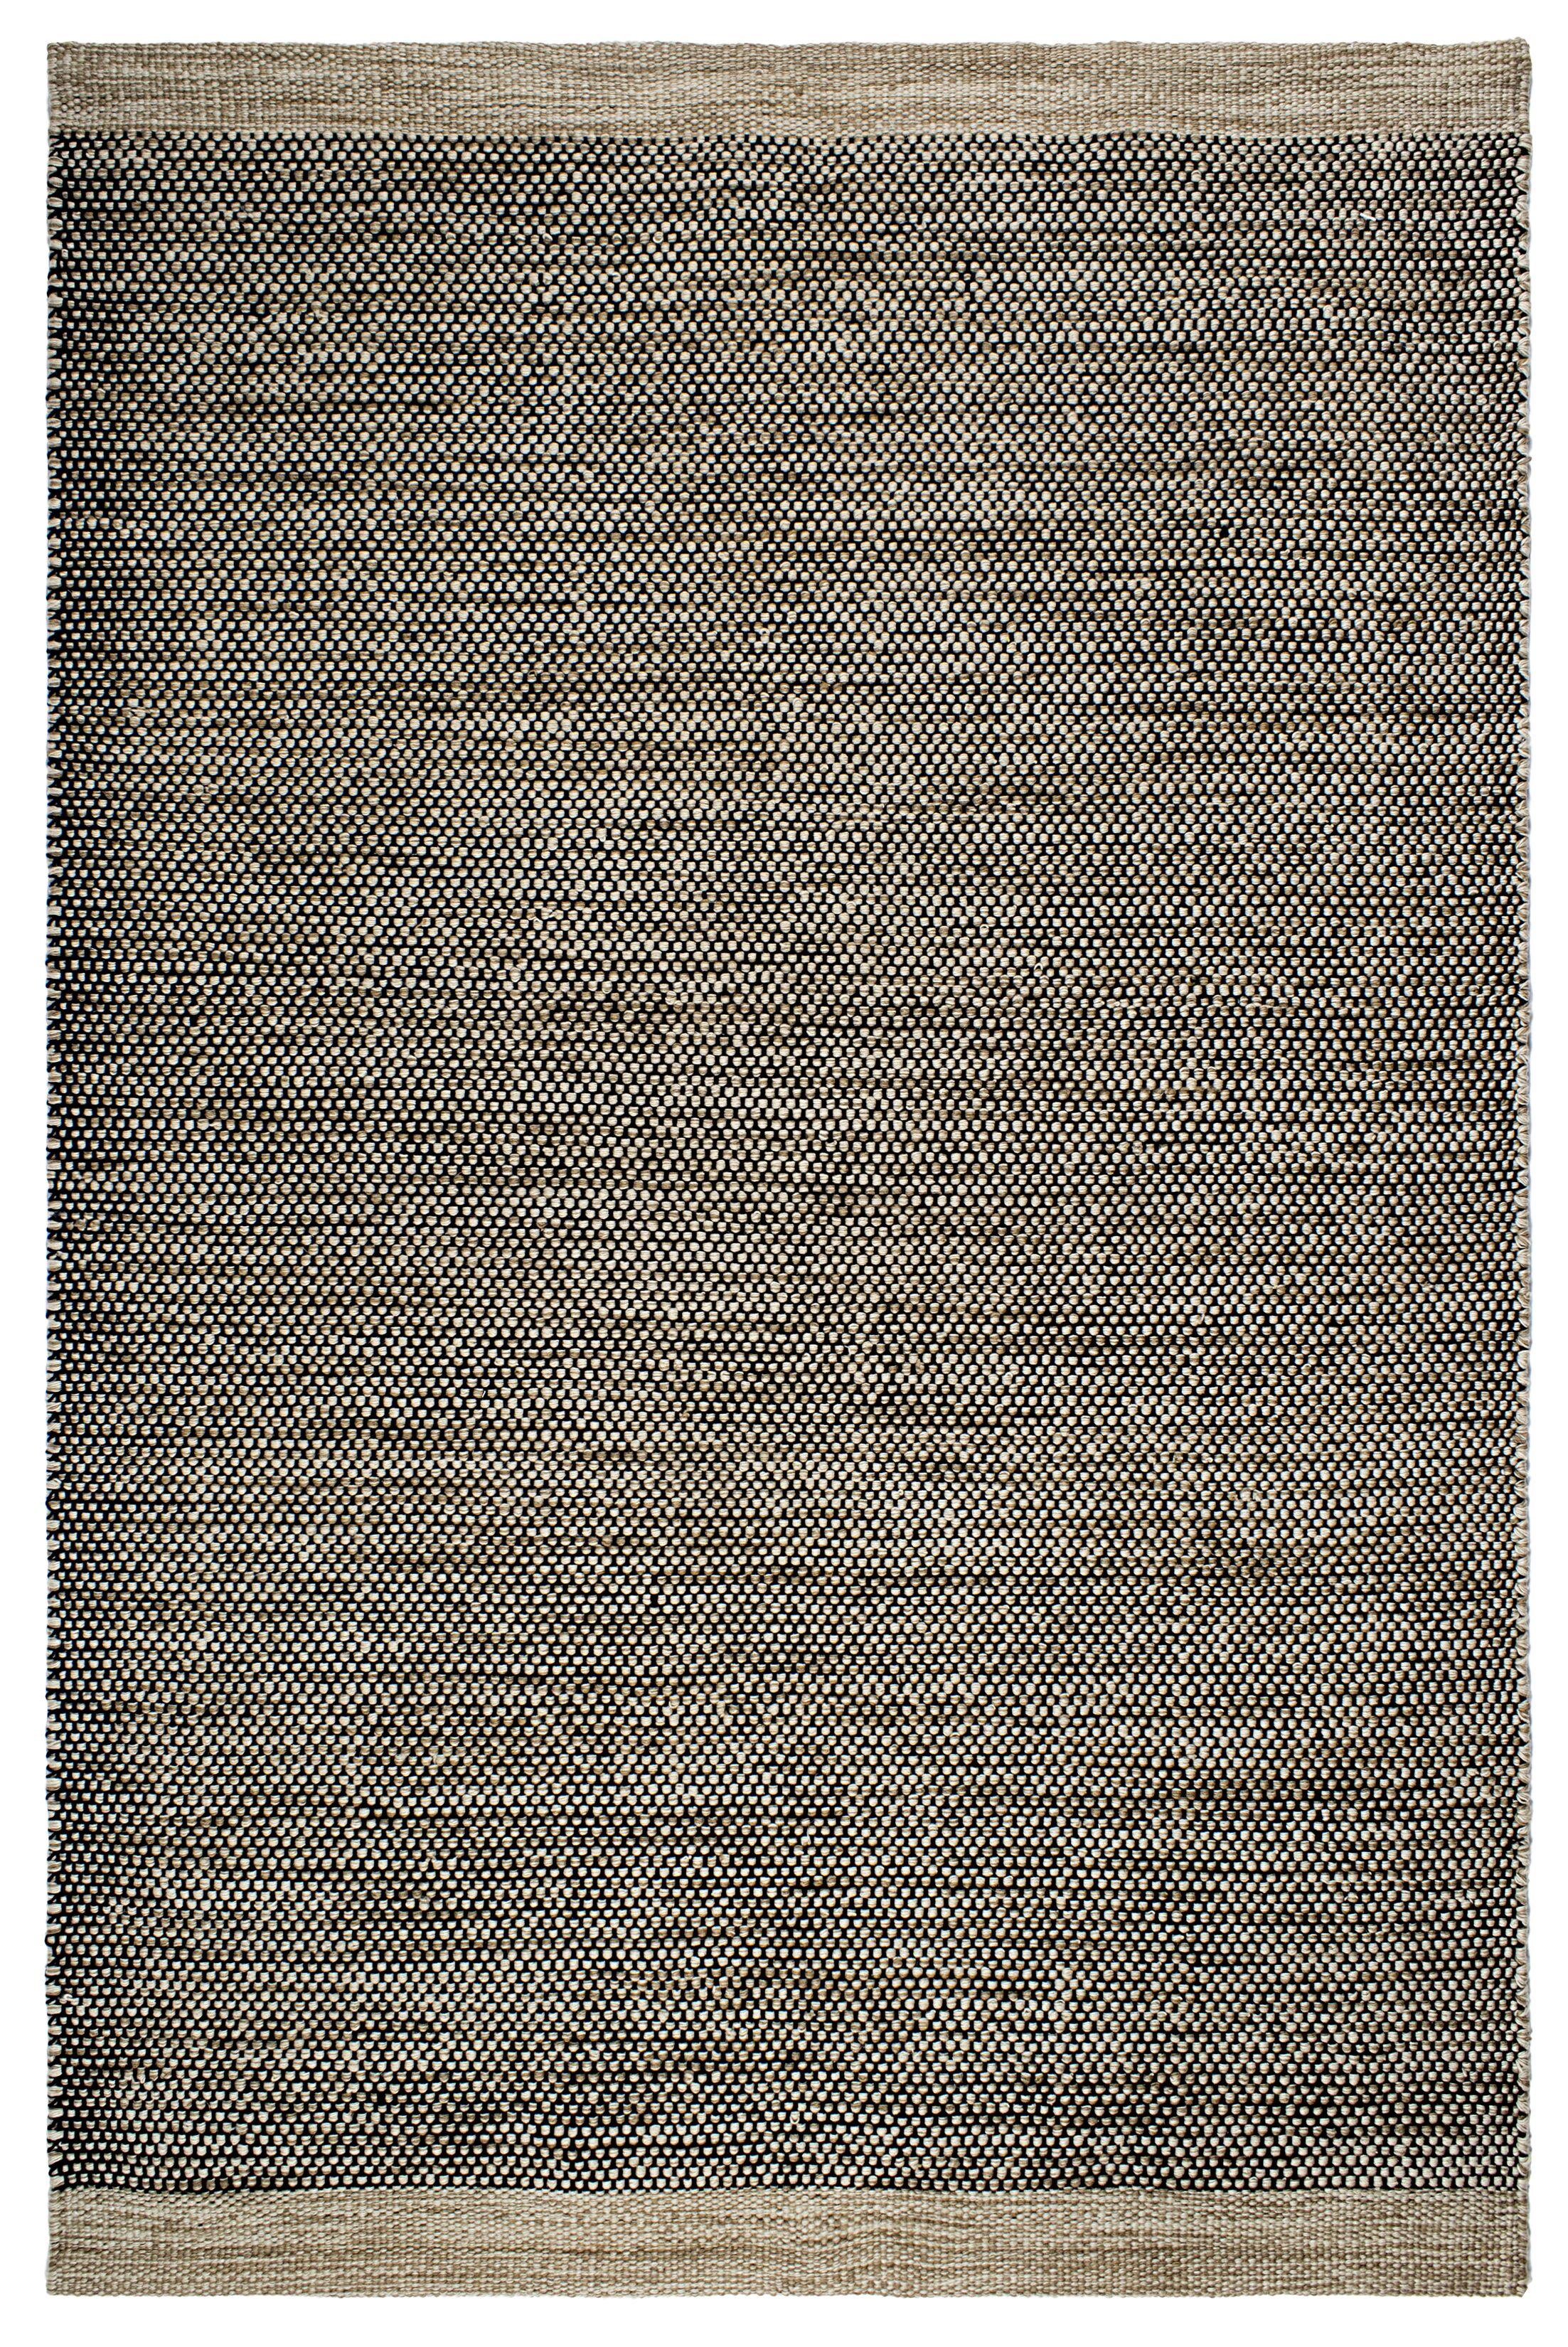 Markowski Hand-Woven Black/Beige Indoor/Outdoor Area Rug Rug Size: 8' x 10'